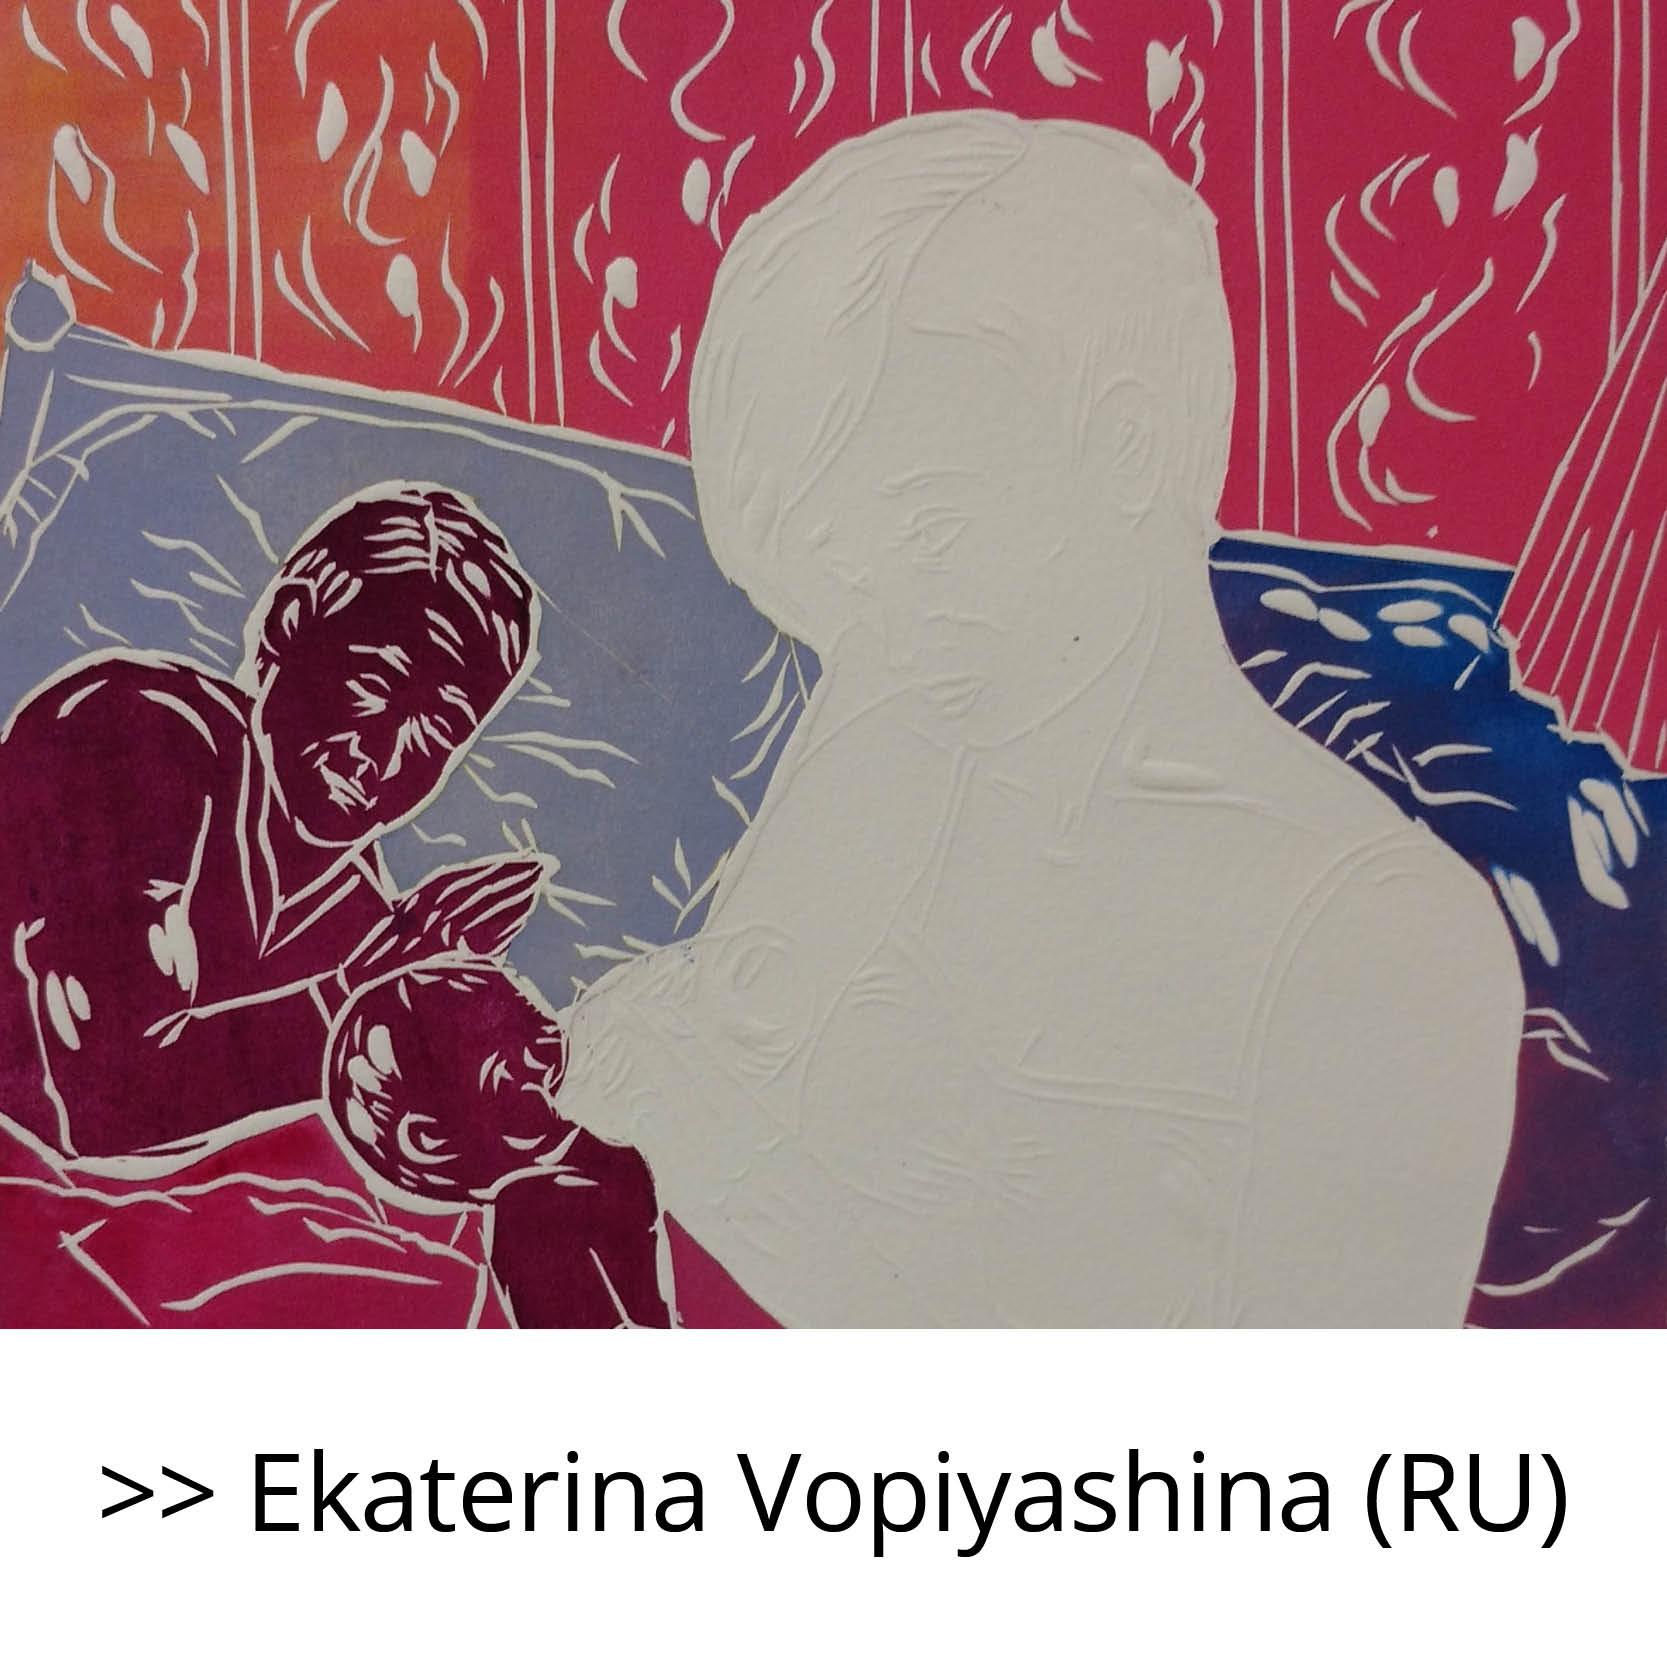 Ekaterina_Vopiyashina_(RU)